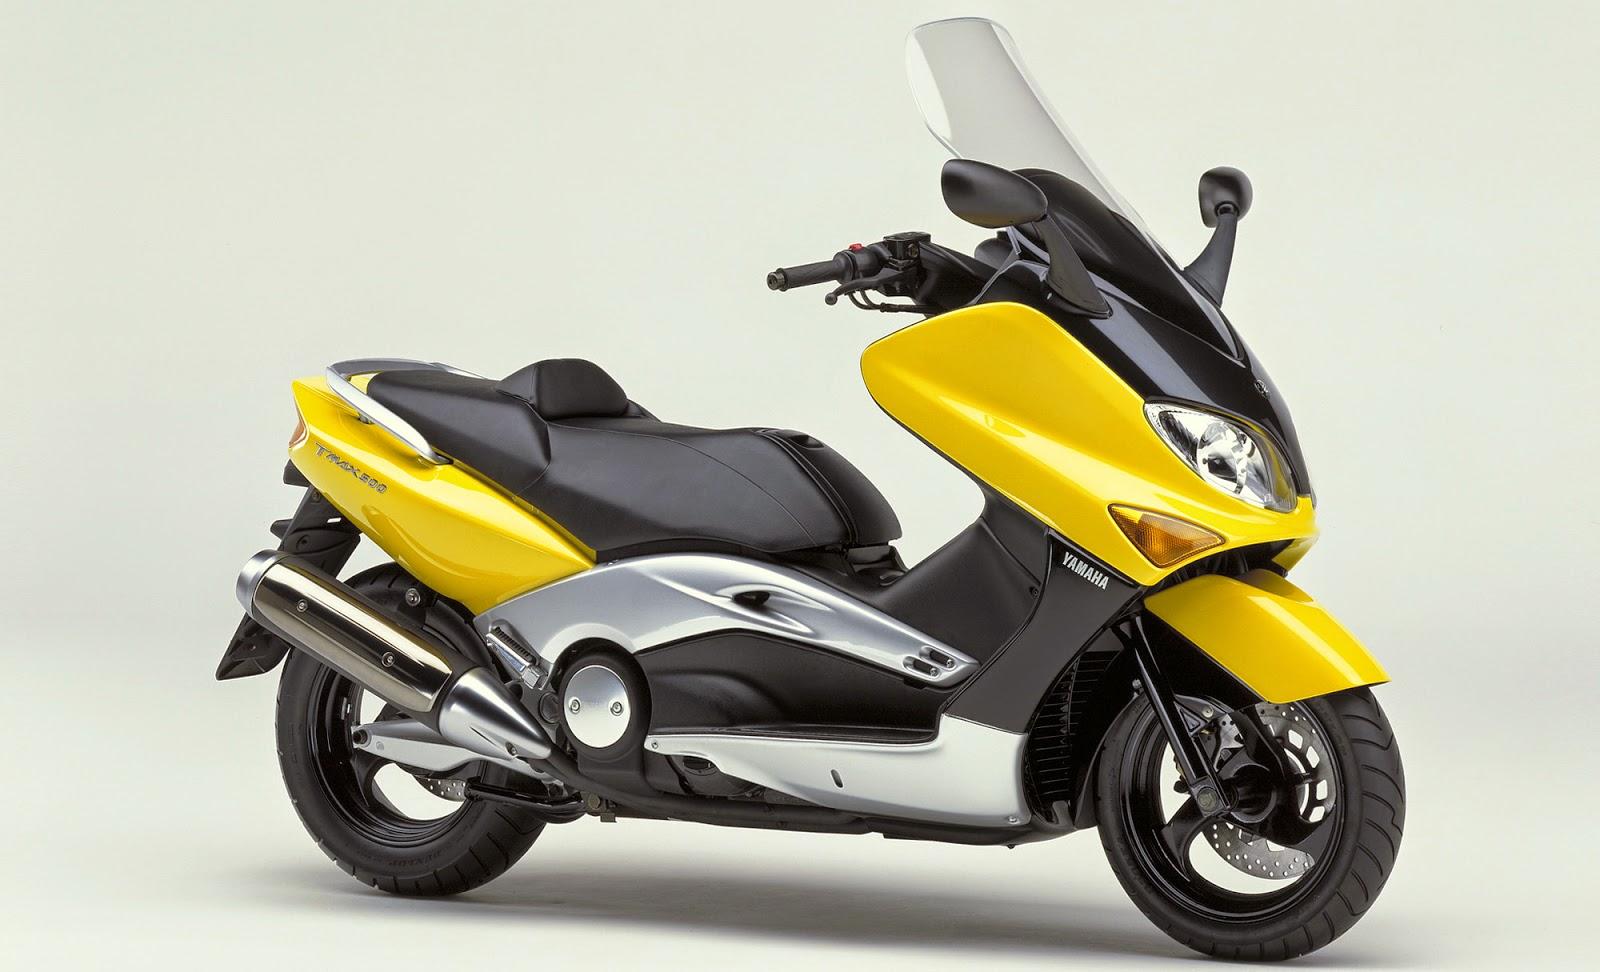 Borexstroke yamaha max series meet up for Yamaha series a